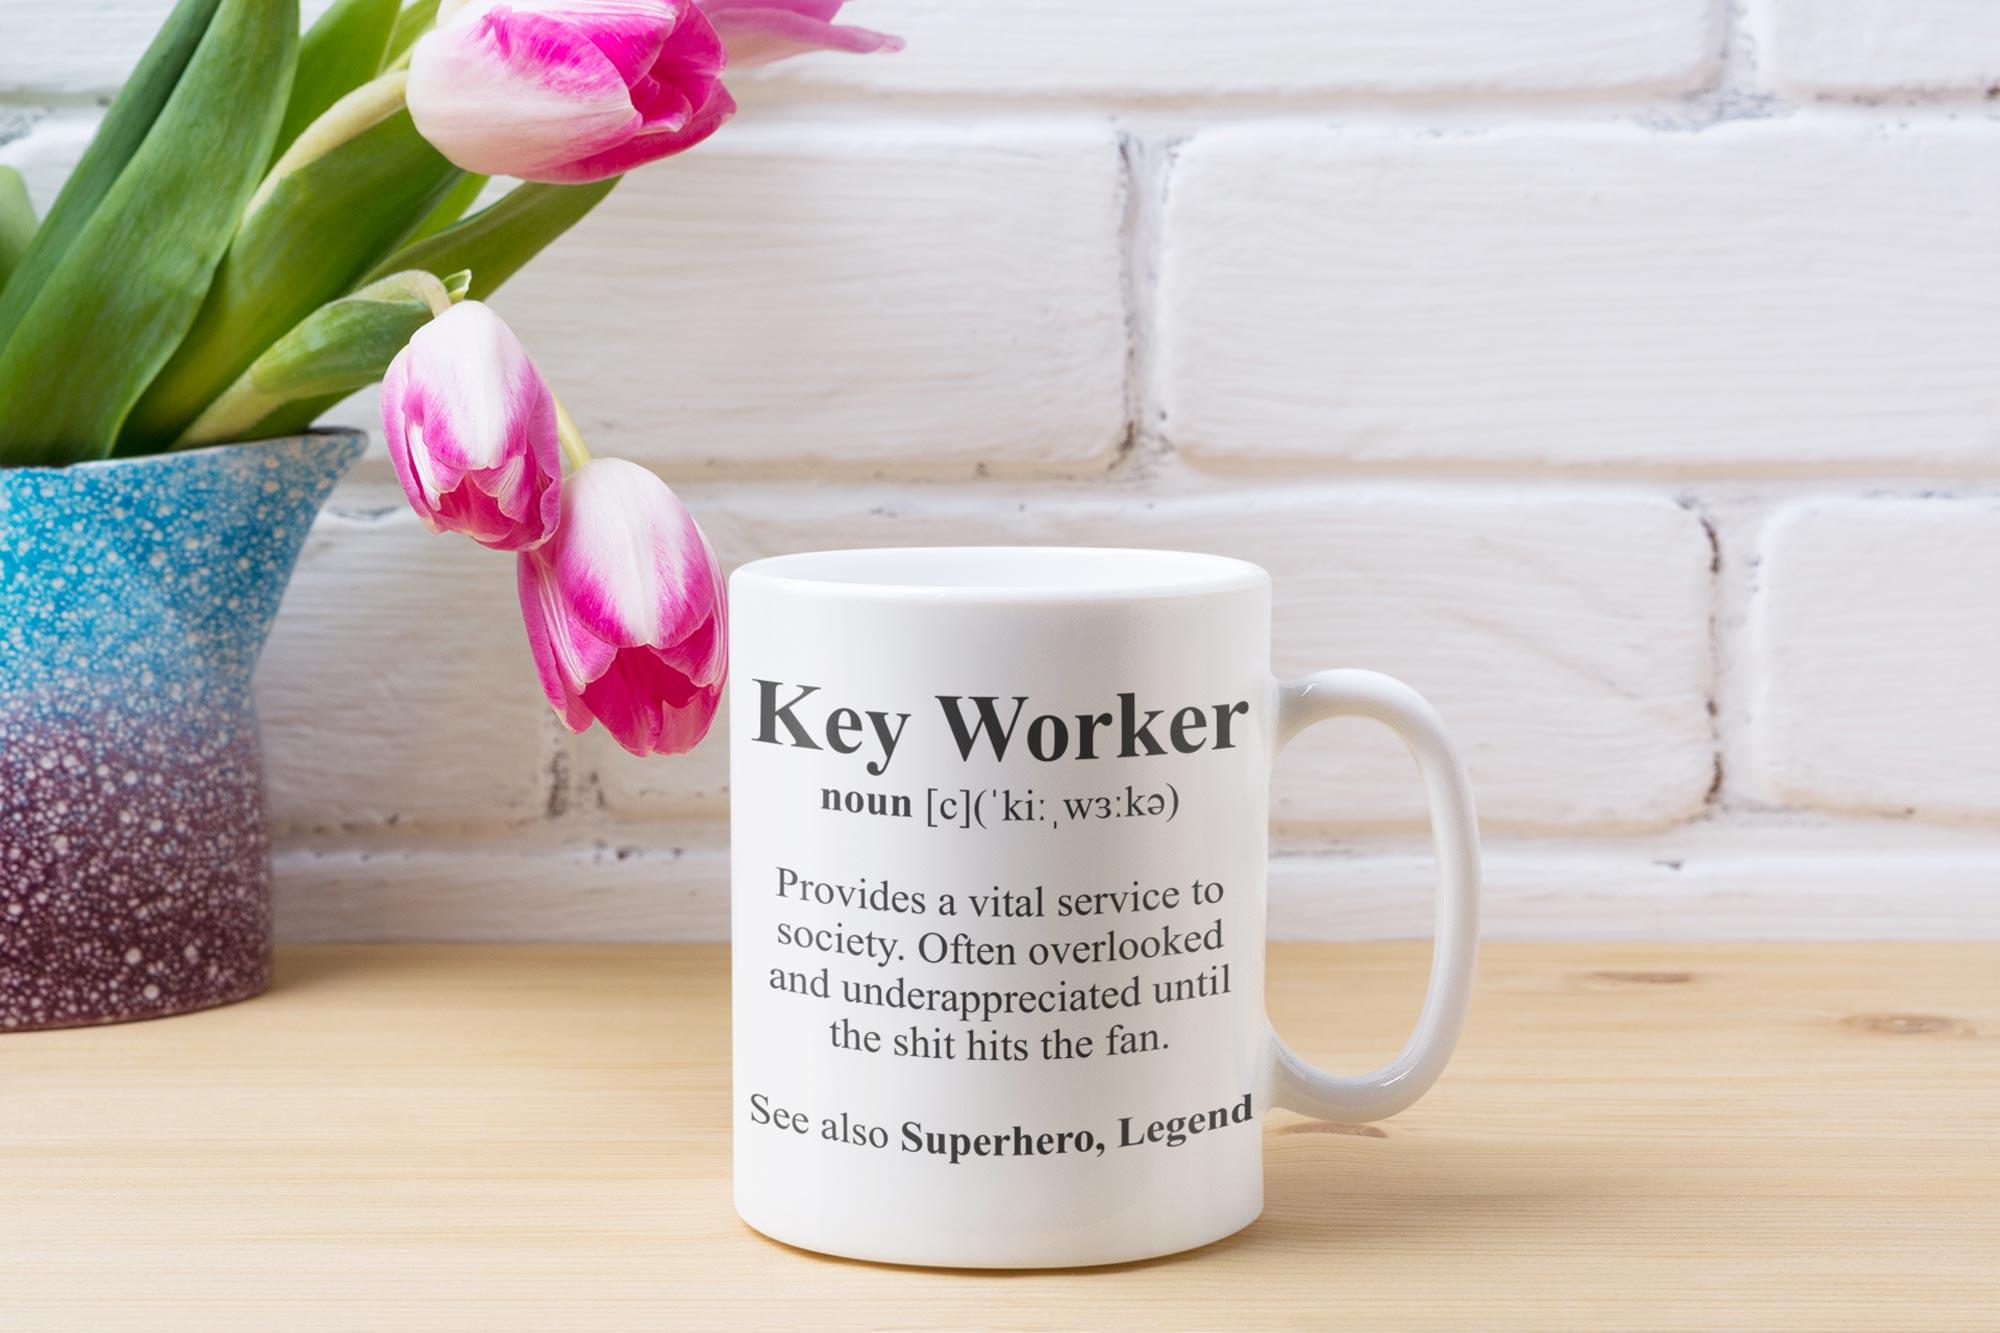 a key worker mug on a desk with flowers